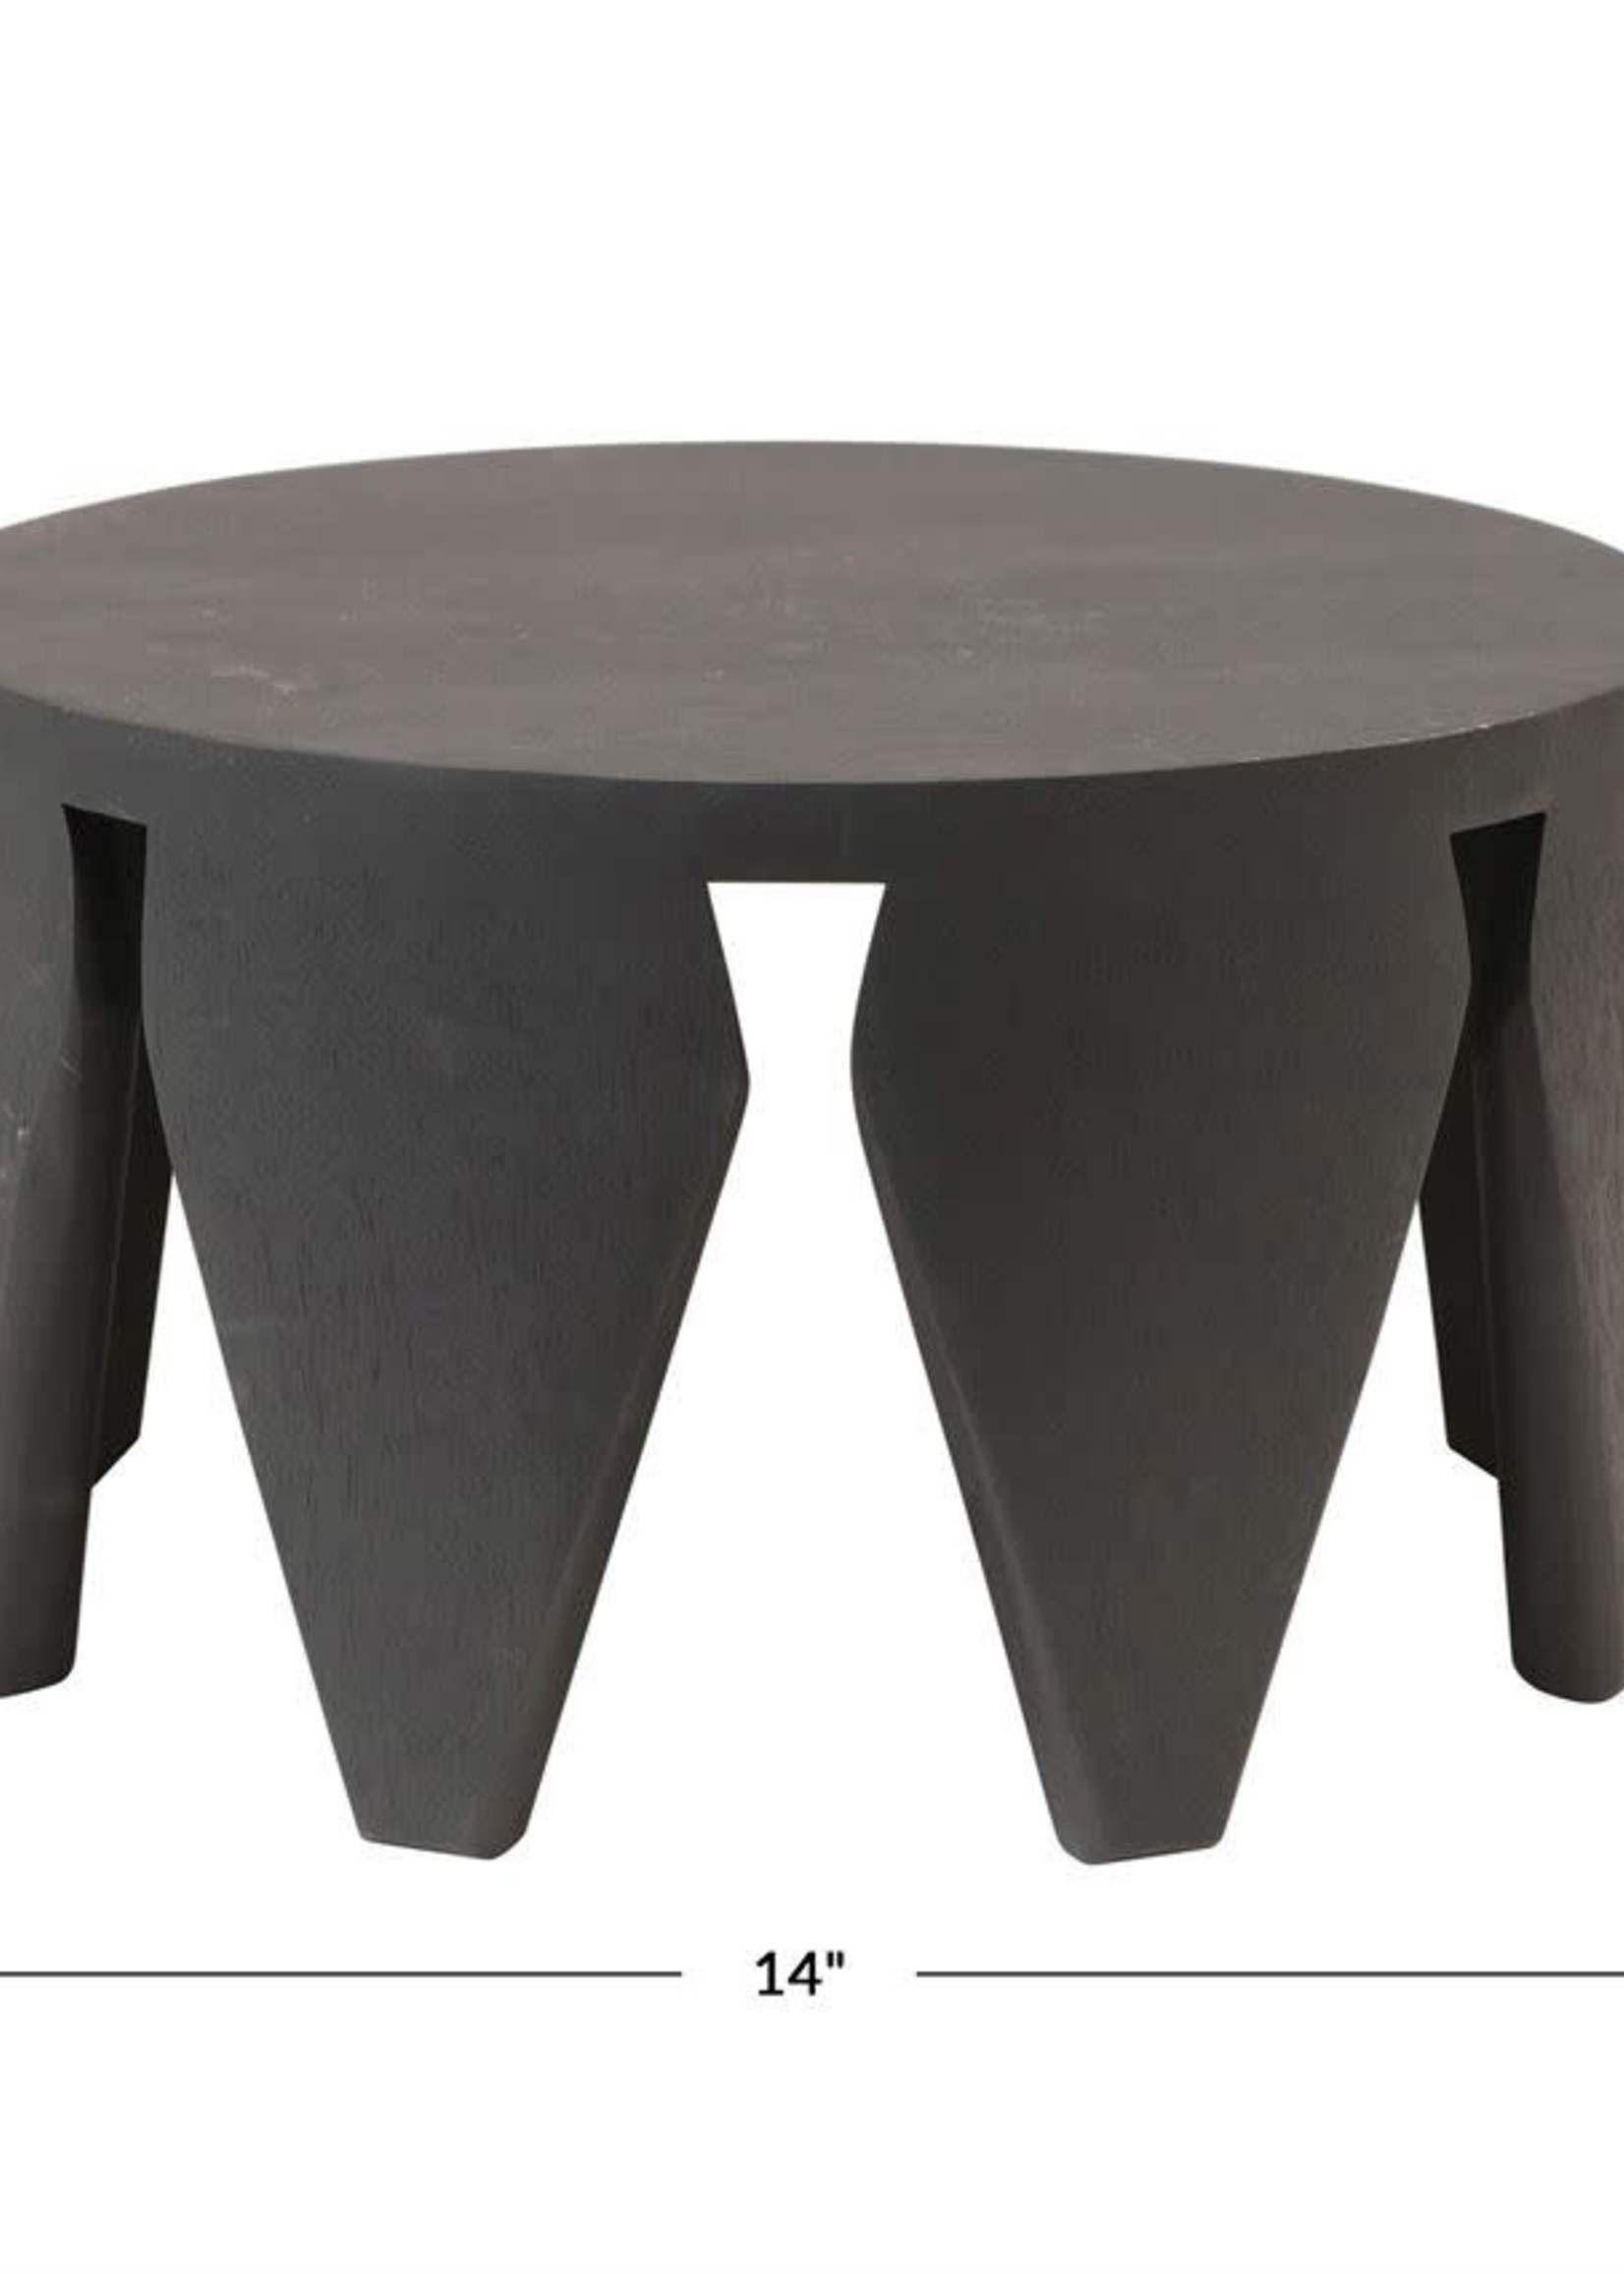 Mango Wood Footed Pedestal, Black